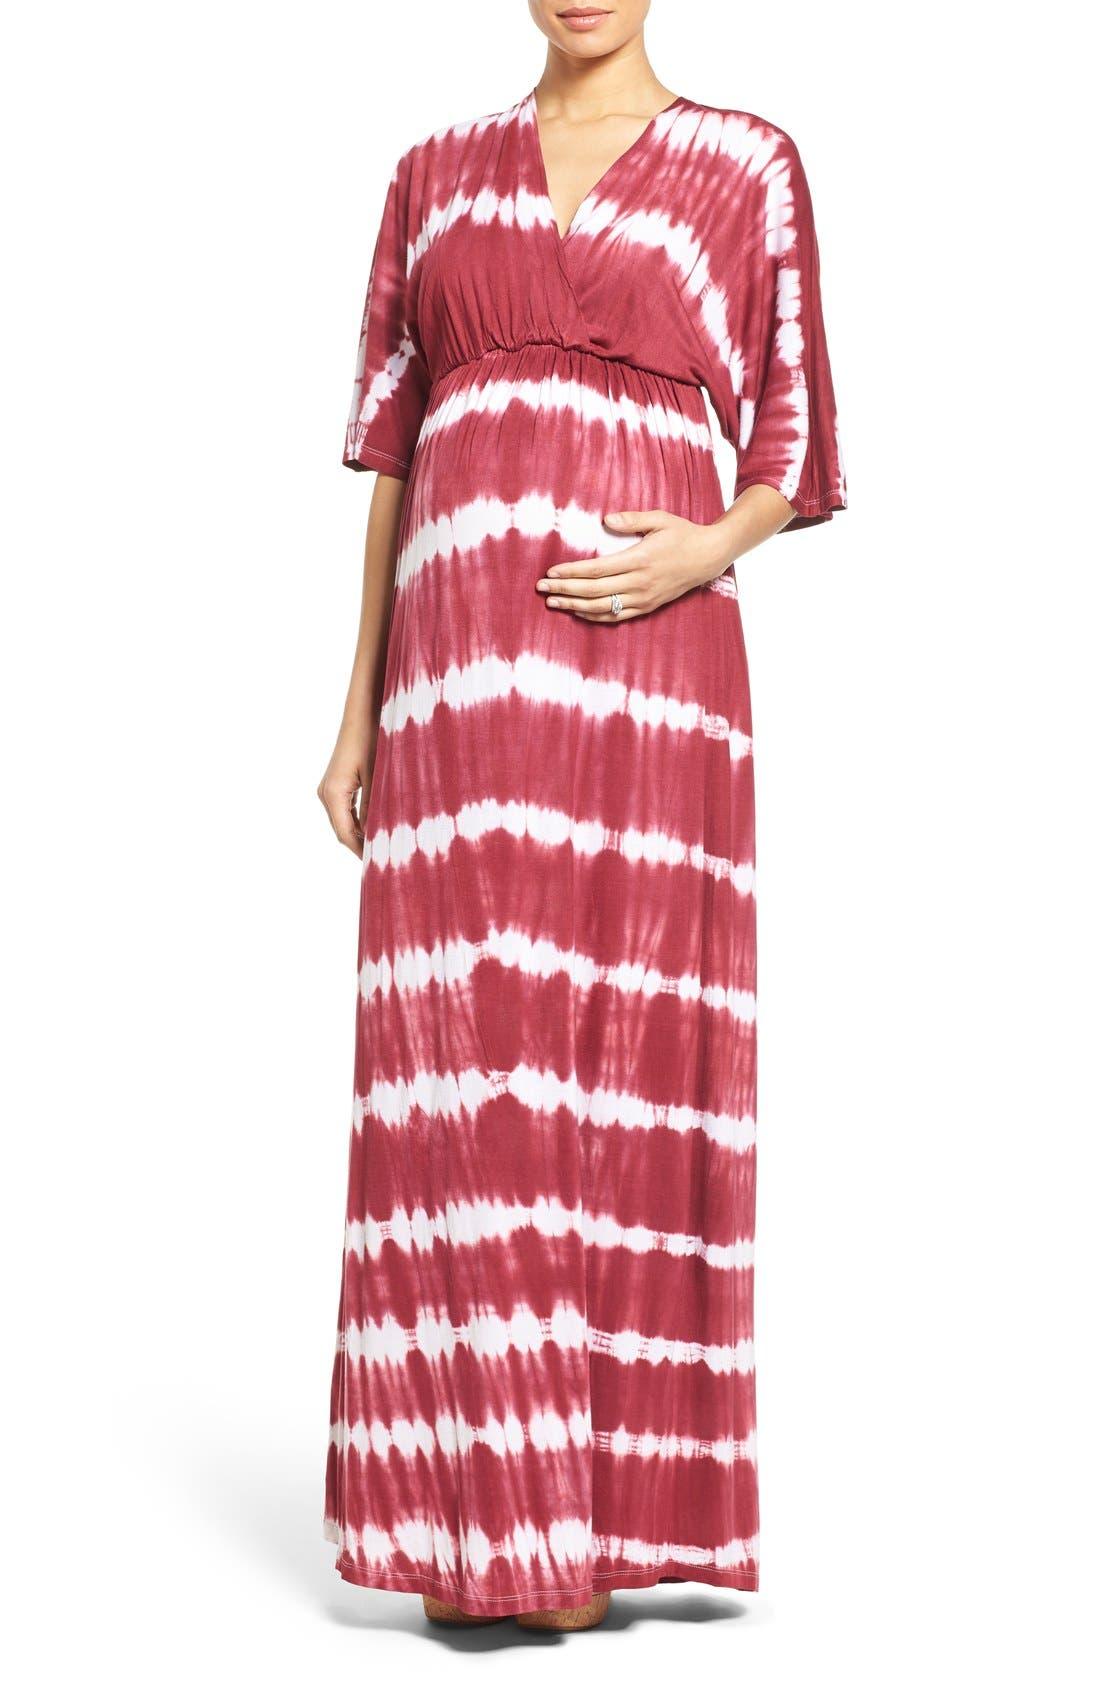 Alternate Image 1 Selected - Fillyboo 'Dream Shakey' Tie Dye Maternity Maxi Dress